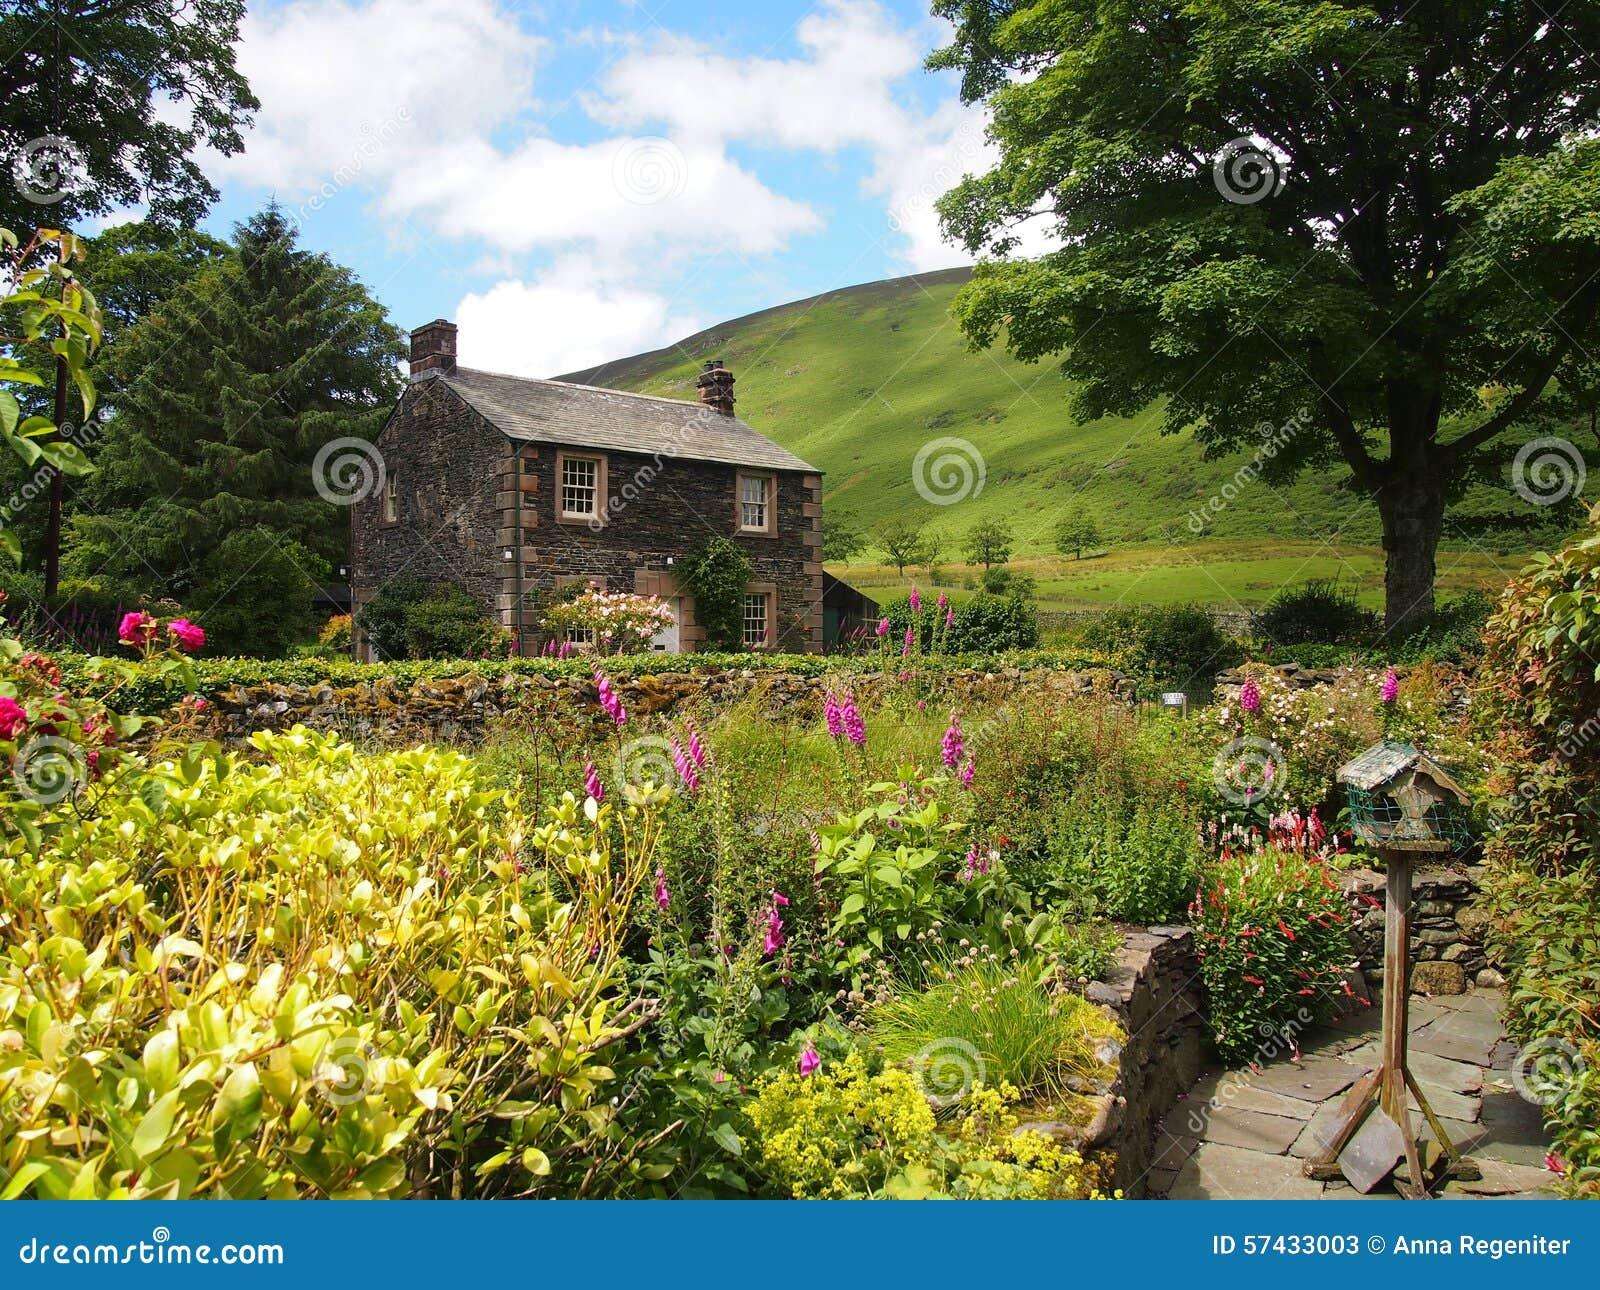 Typical English Village Stock Photo Image 57433003